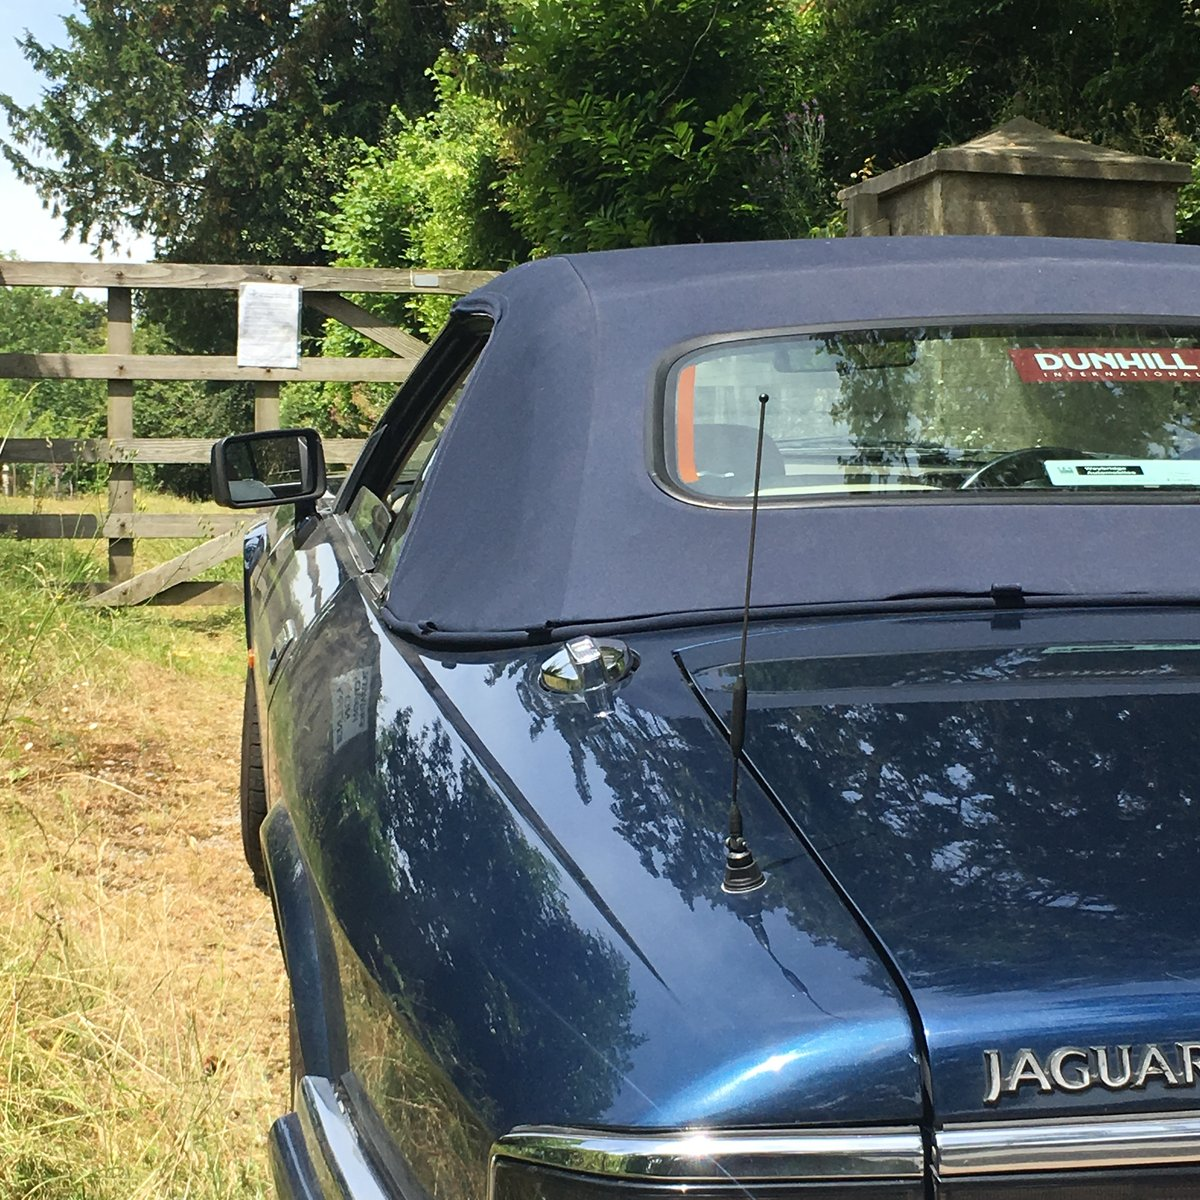 1995 Jaguar xjs Convertible For Sale (picture 6 of 6)